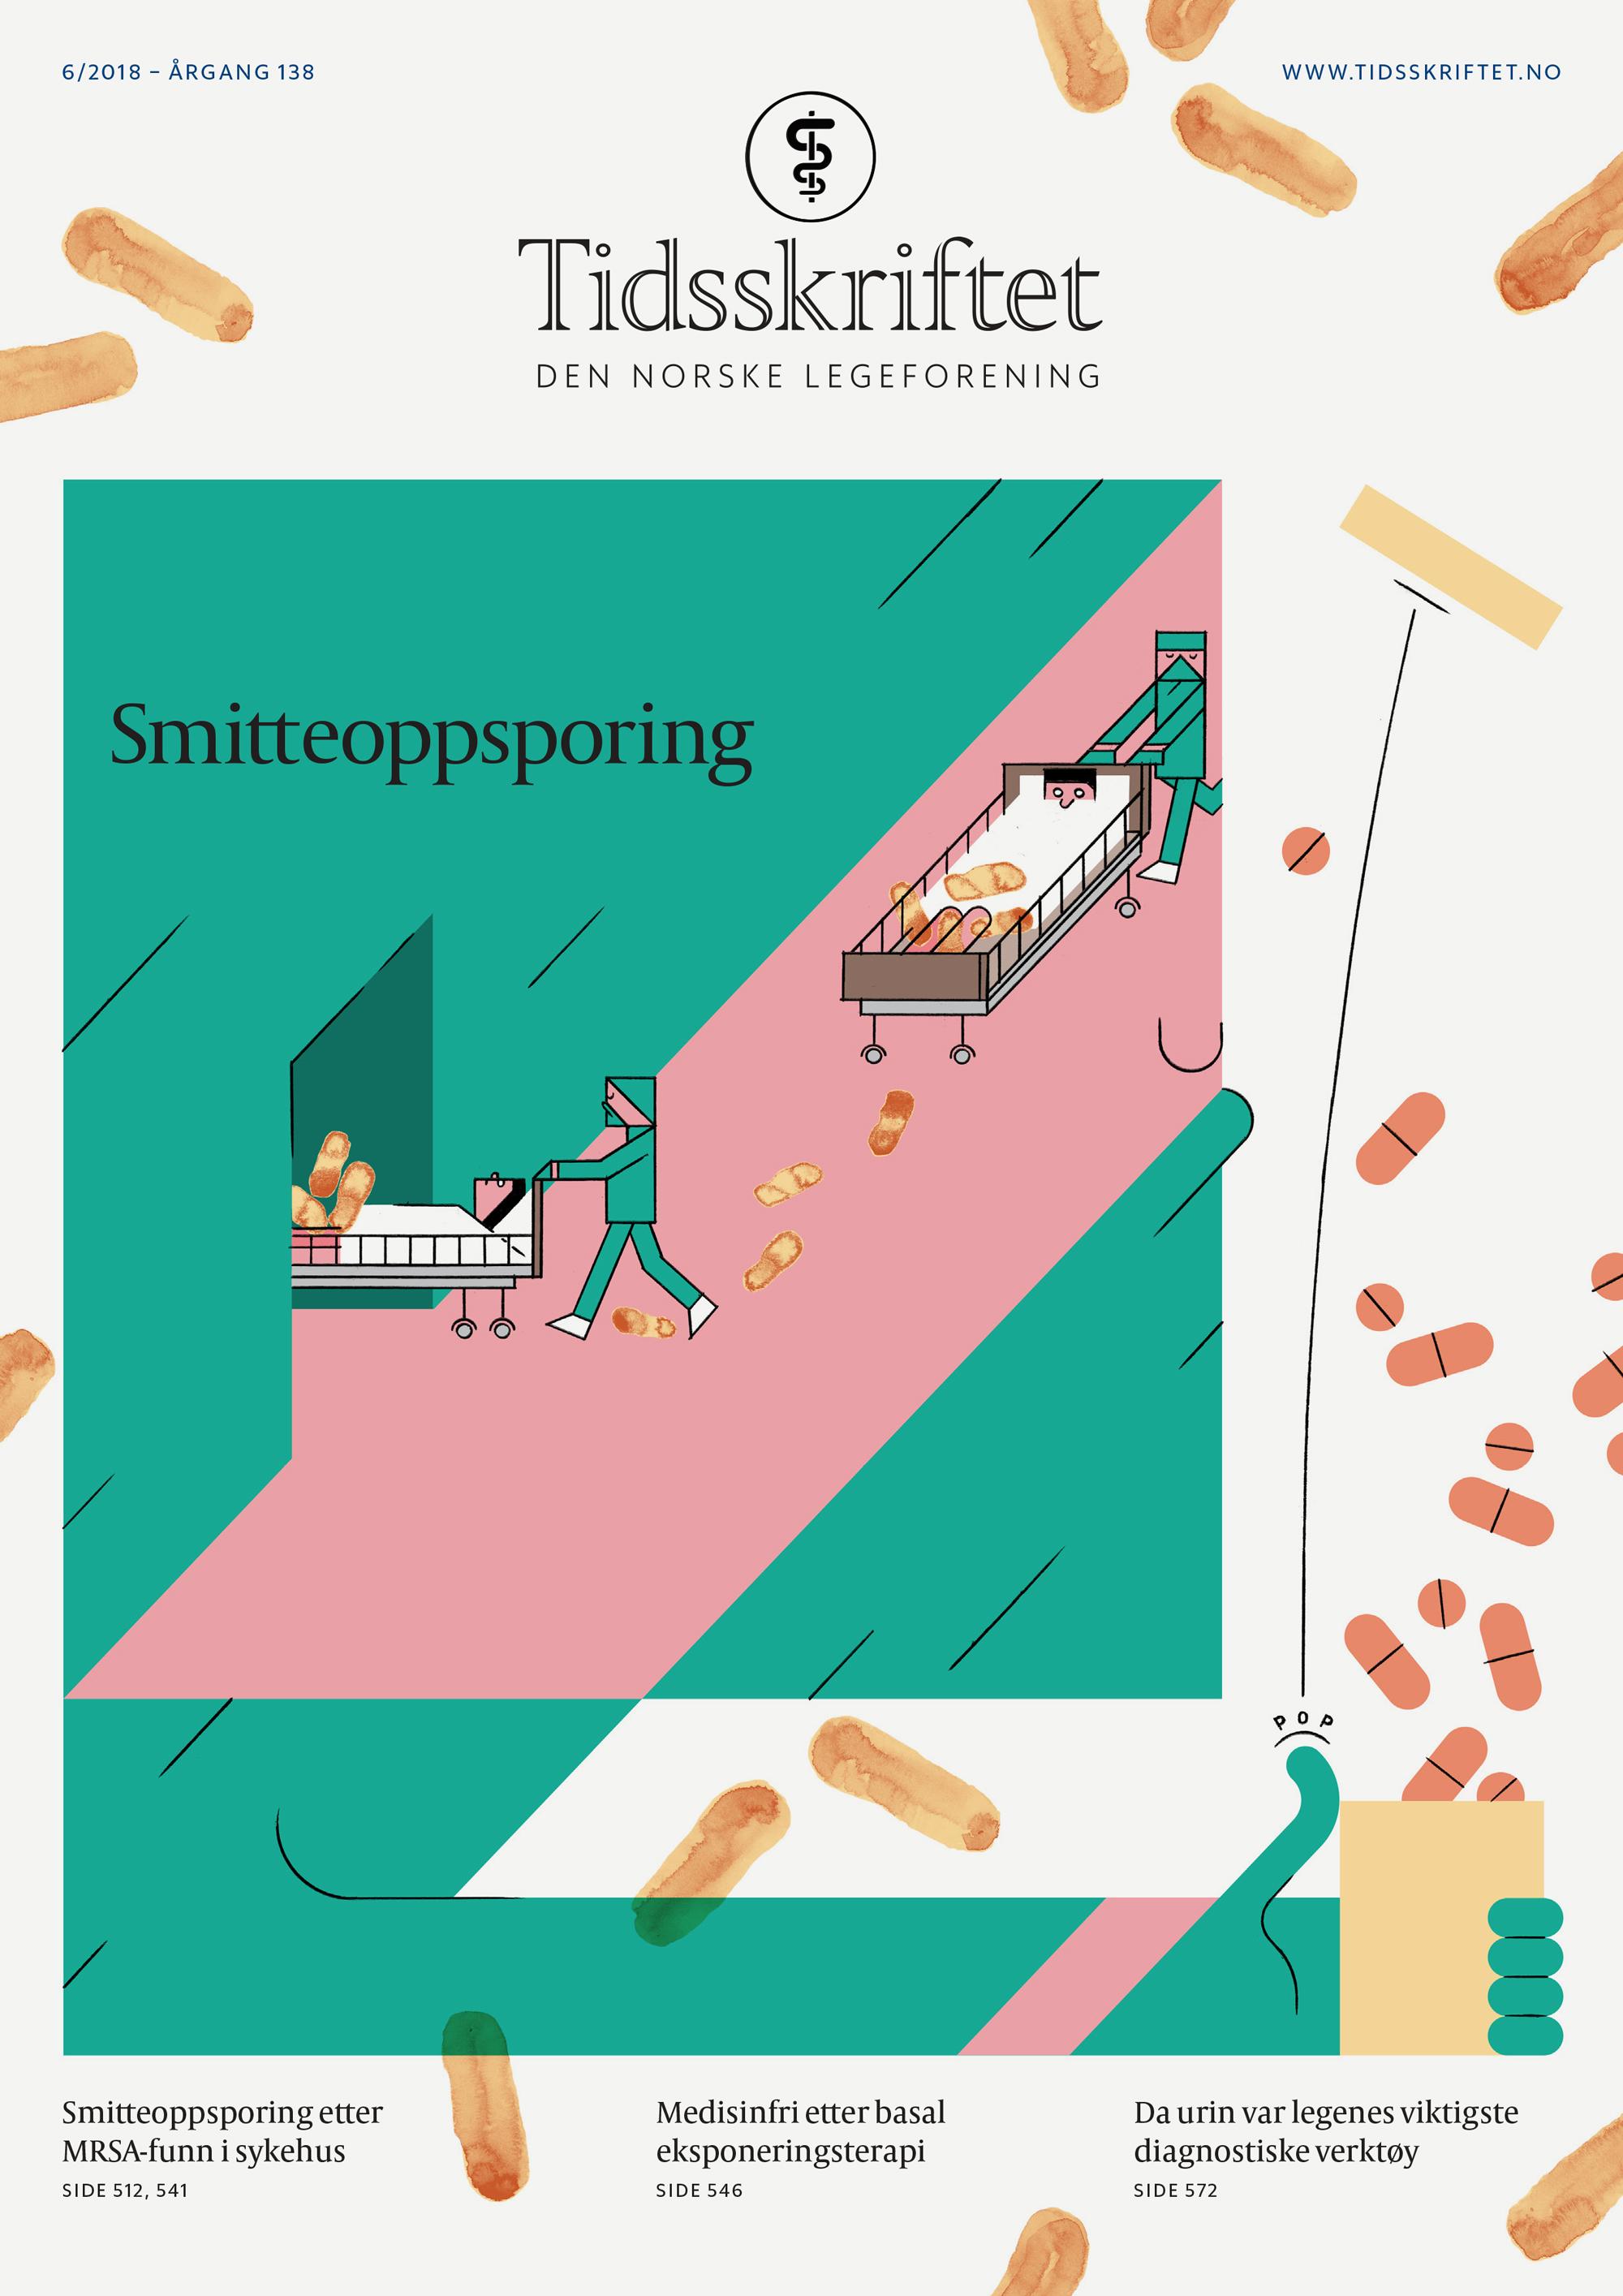 10-Forside-Tidsskriftet-utg6-2018-Åge-Peterson-.jpg